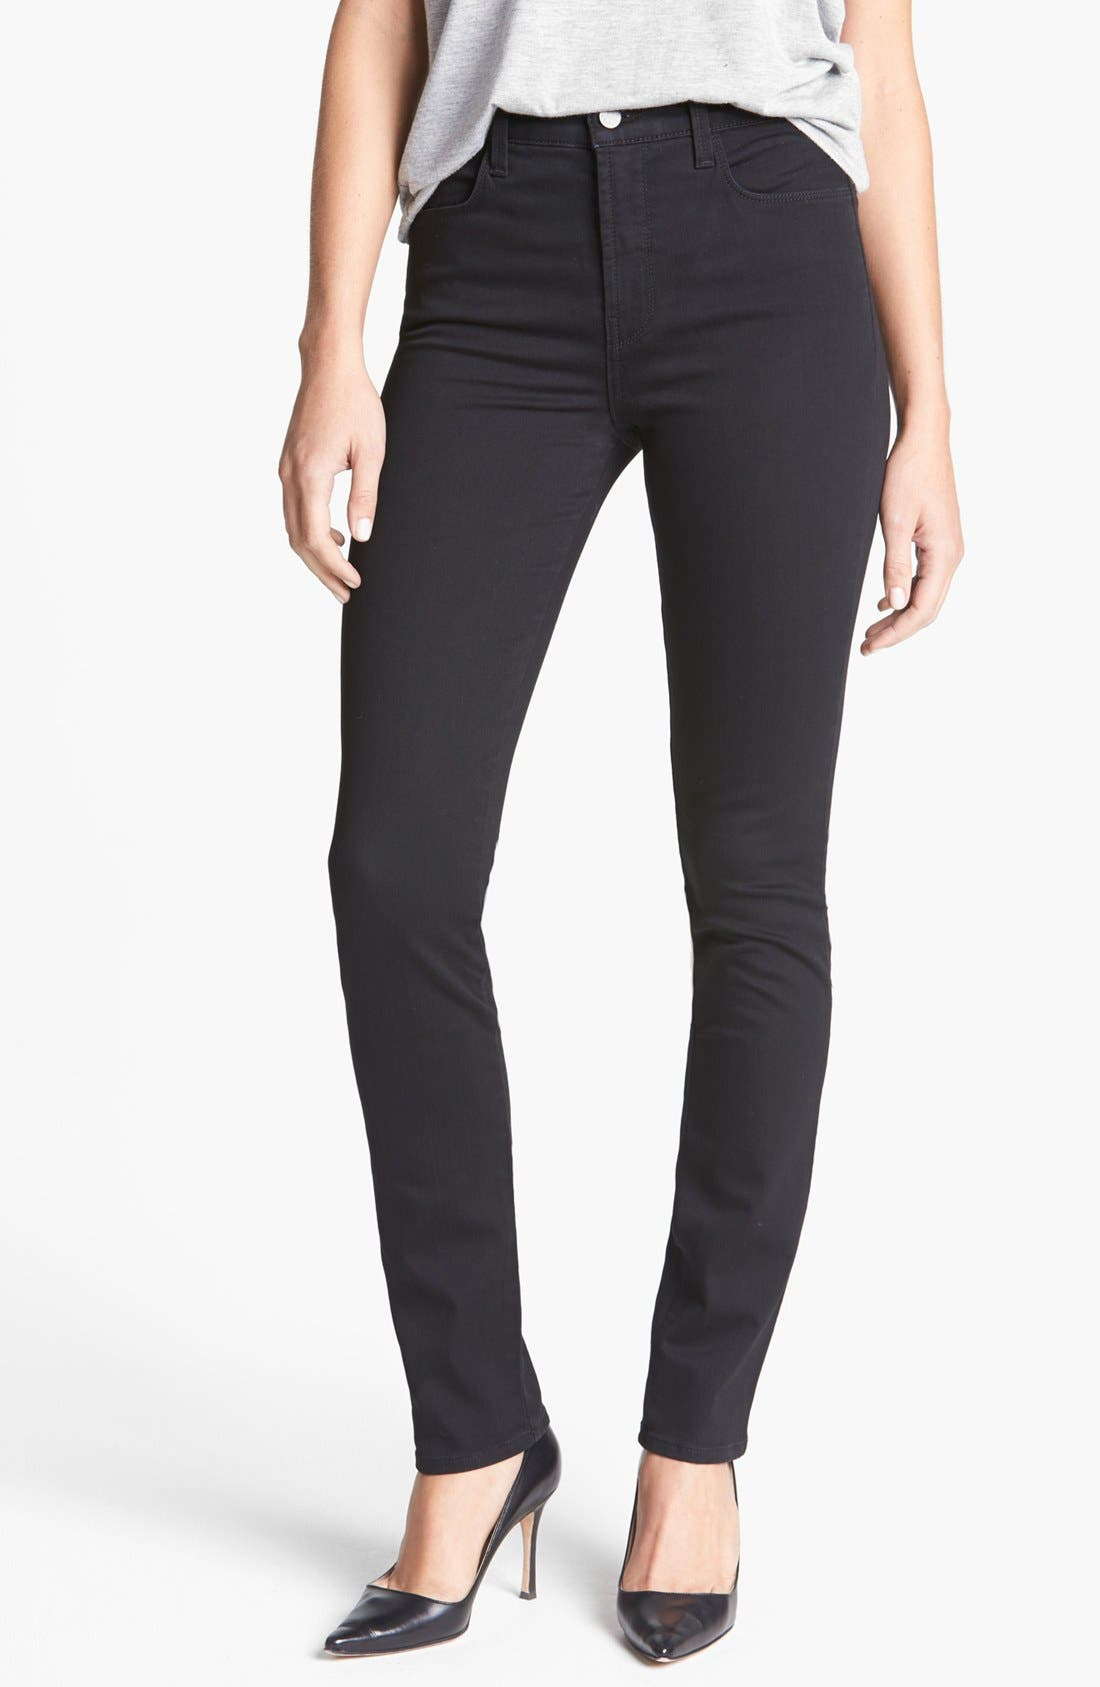 Main Image - J Brand '2112 Rail' High Rise Skinny Jeans (Hewson)